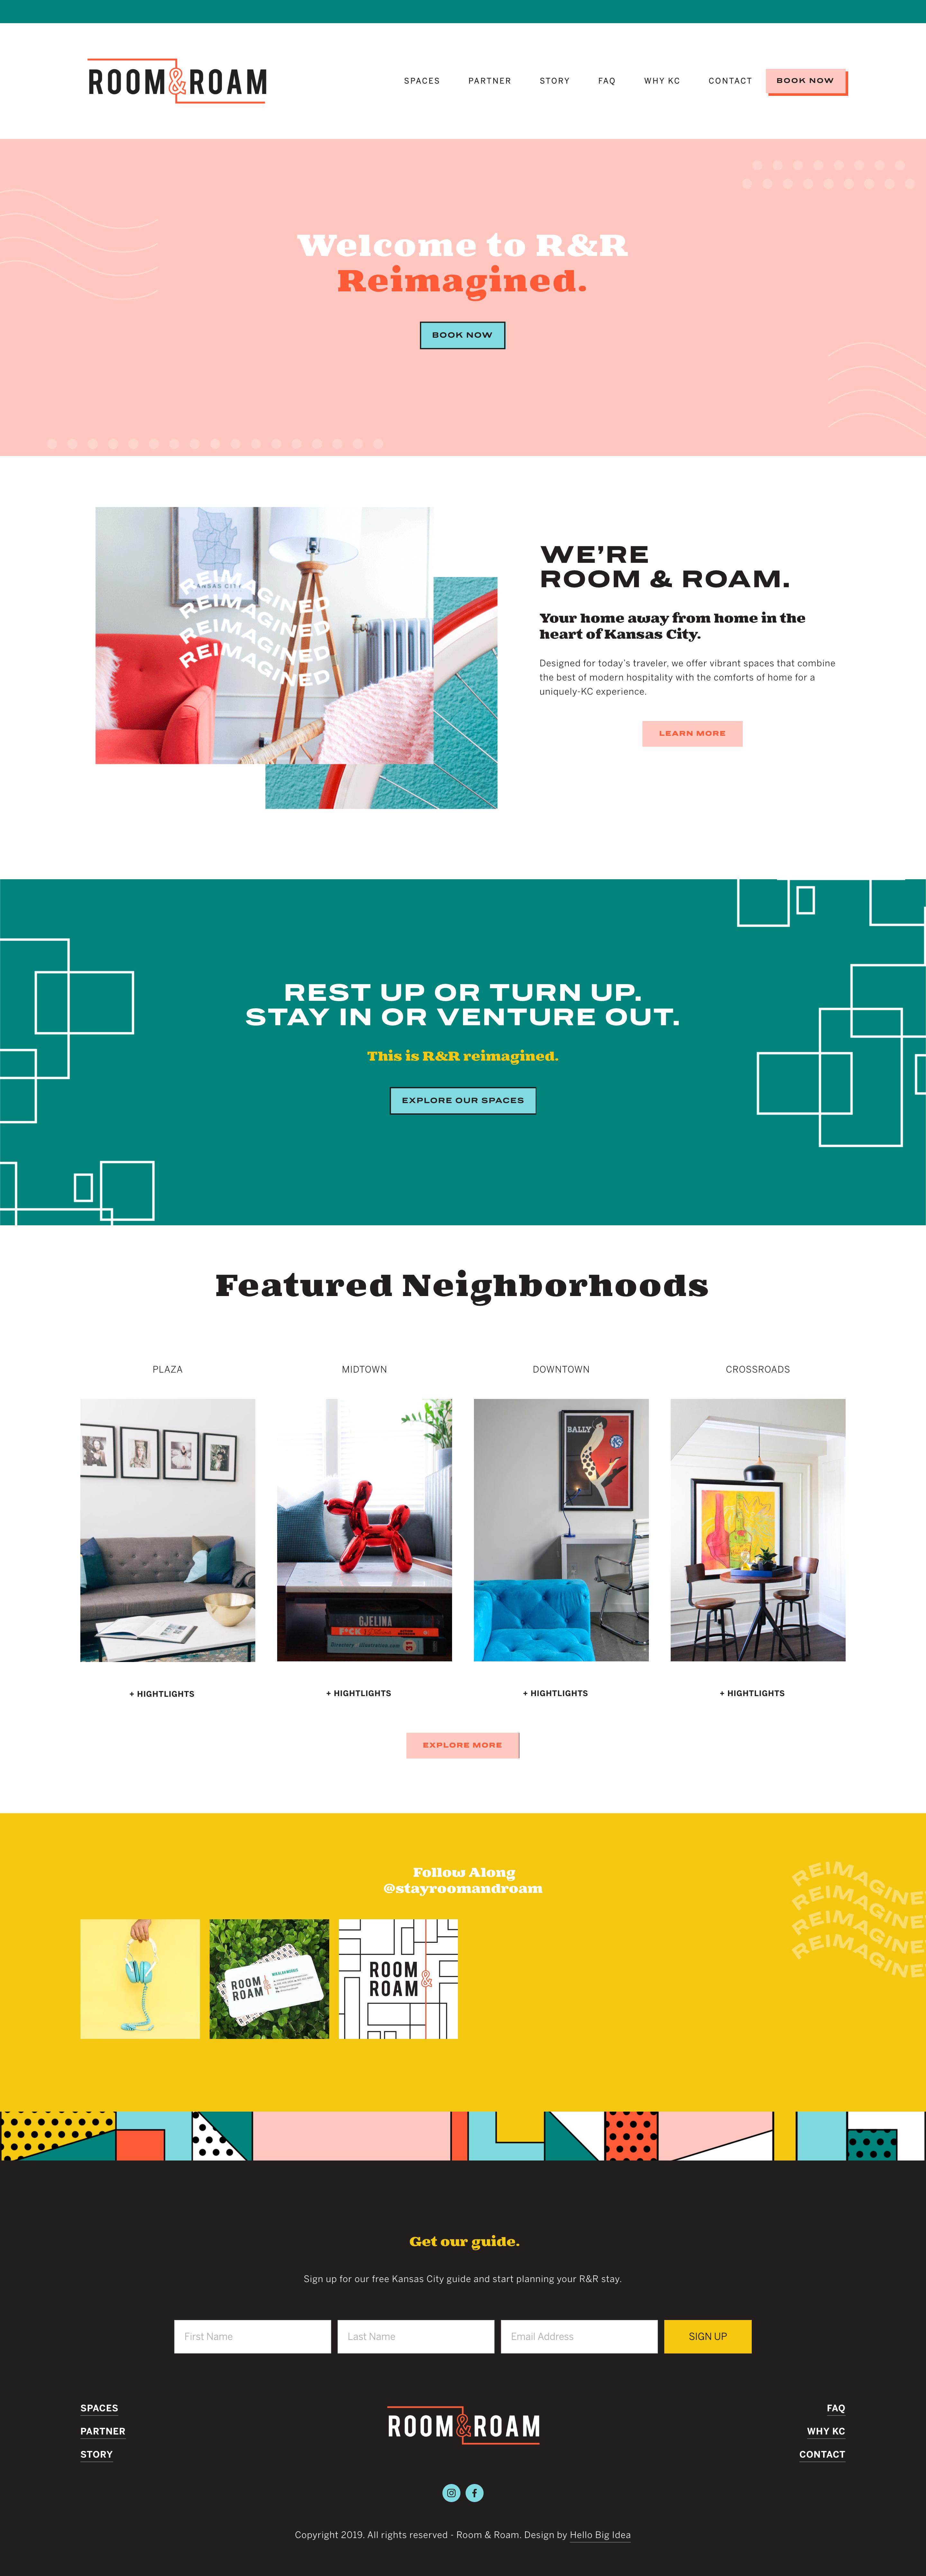 Custom Squarespace Design By Hello Big Idea Squarespace Design Website Design Layout Website Design Trends